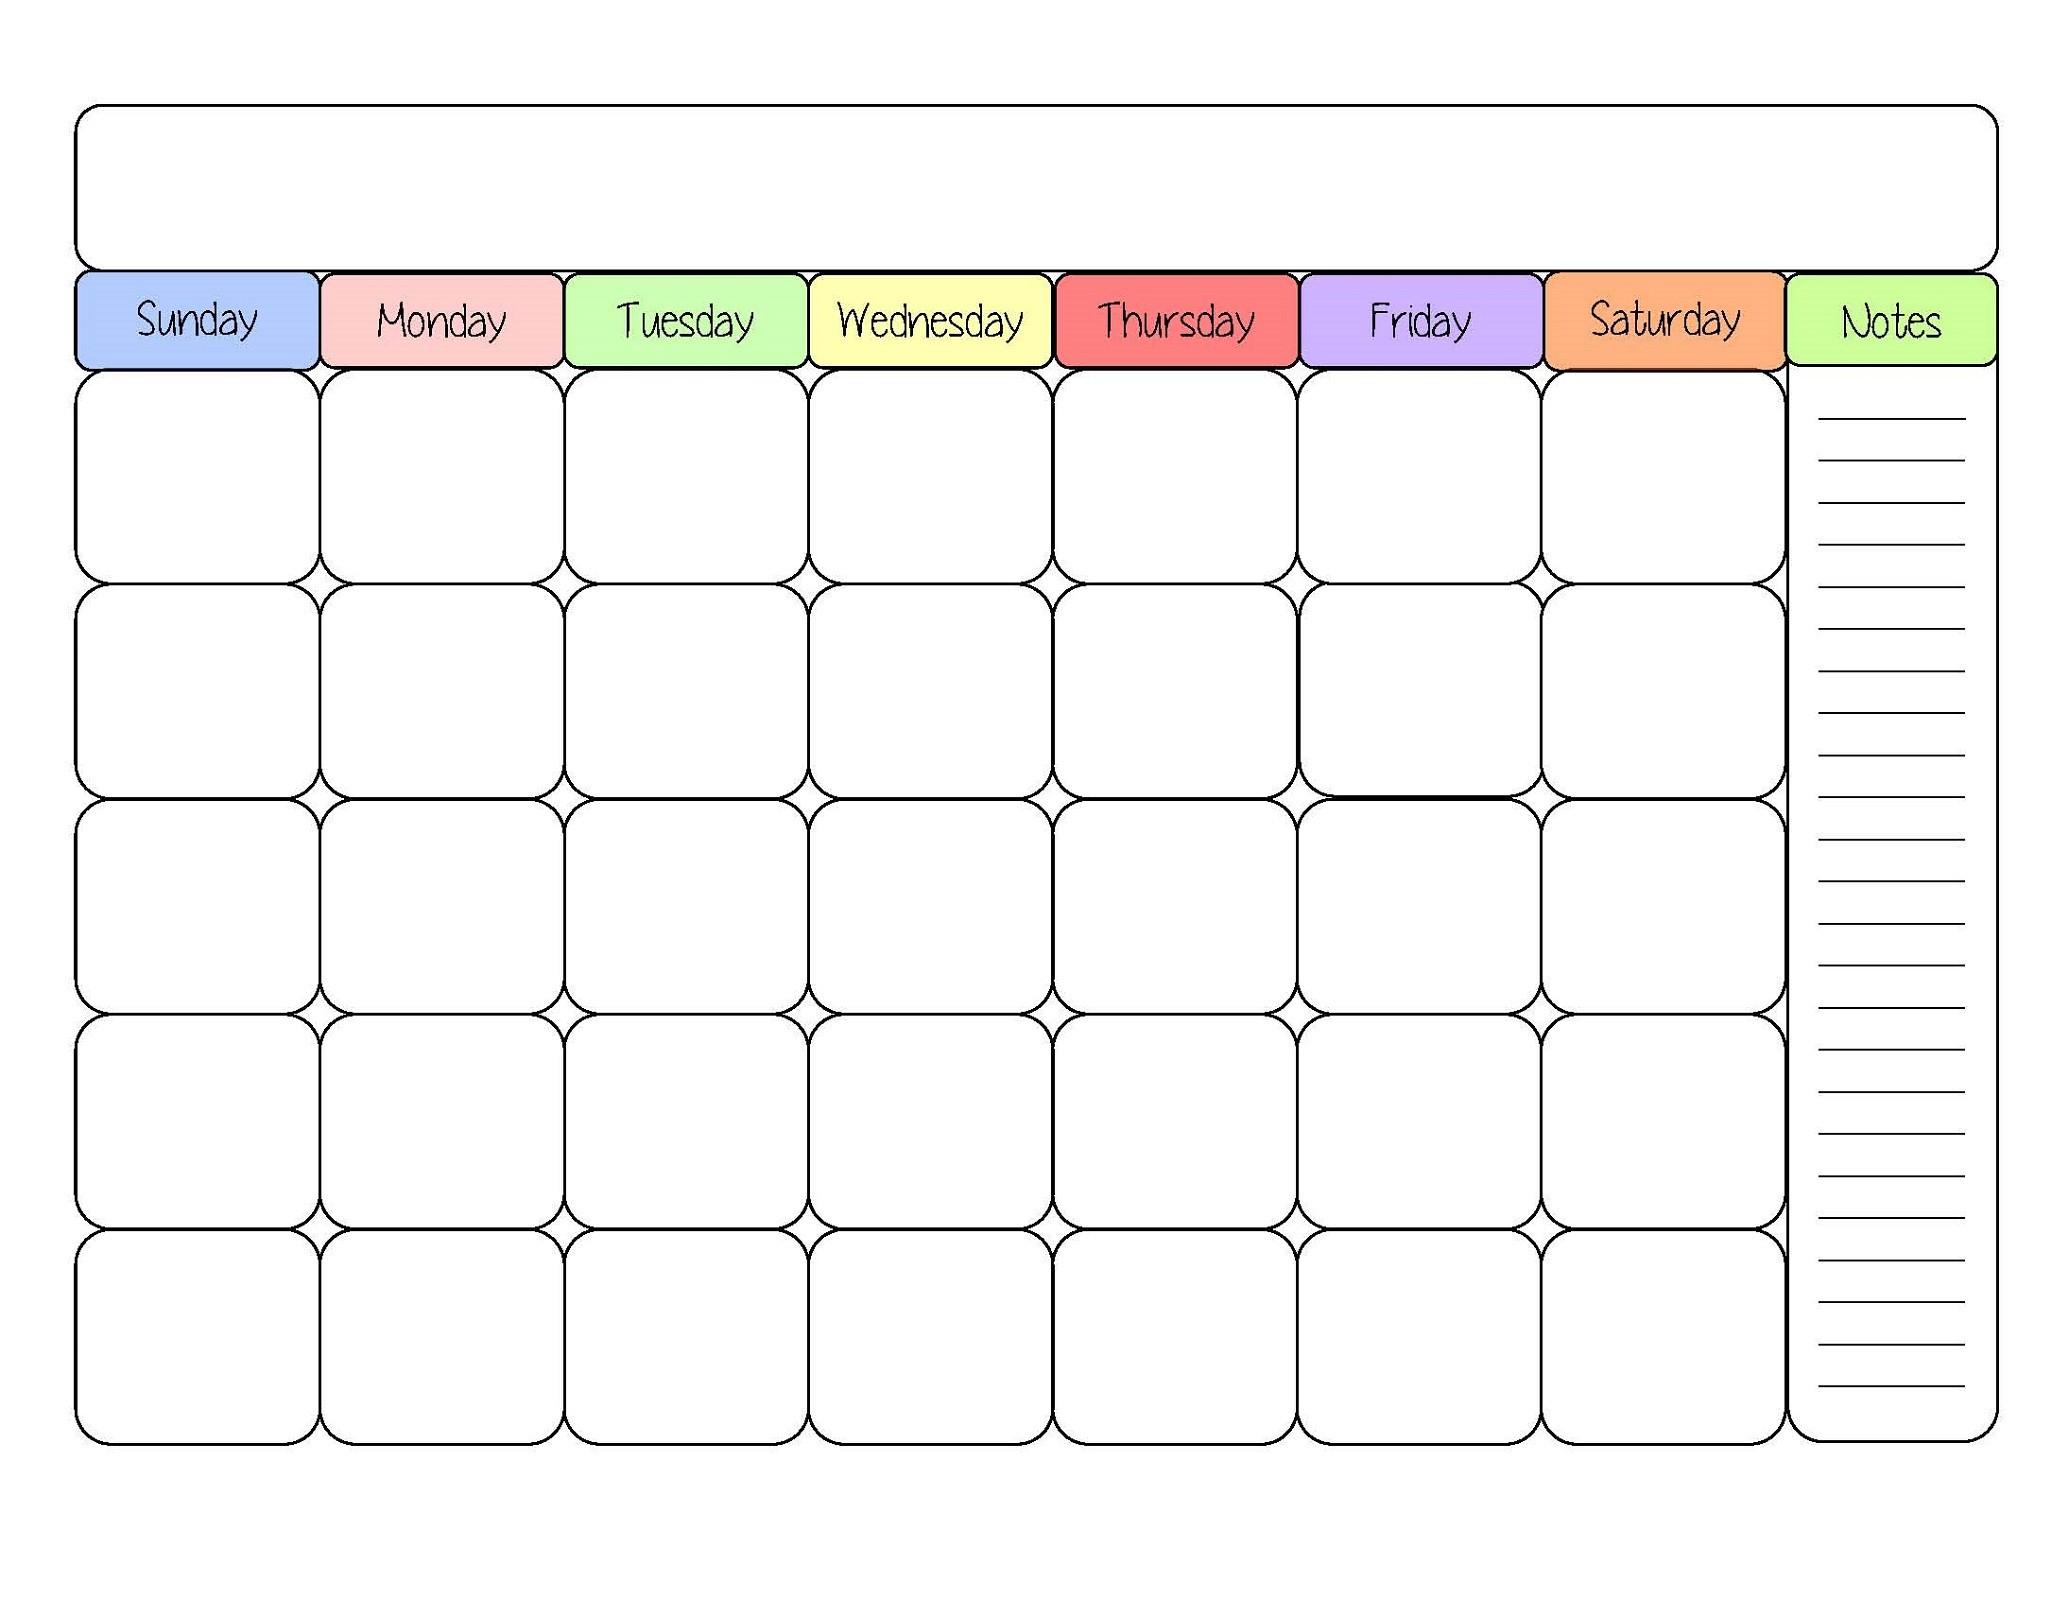 Free Printable Calendar Templates Interesting In Fill In Calendar with regard to Fill In Calendar Templates